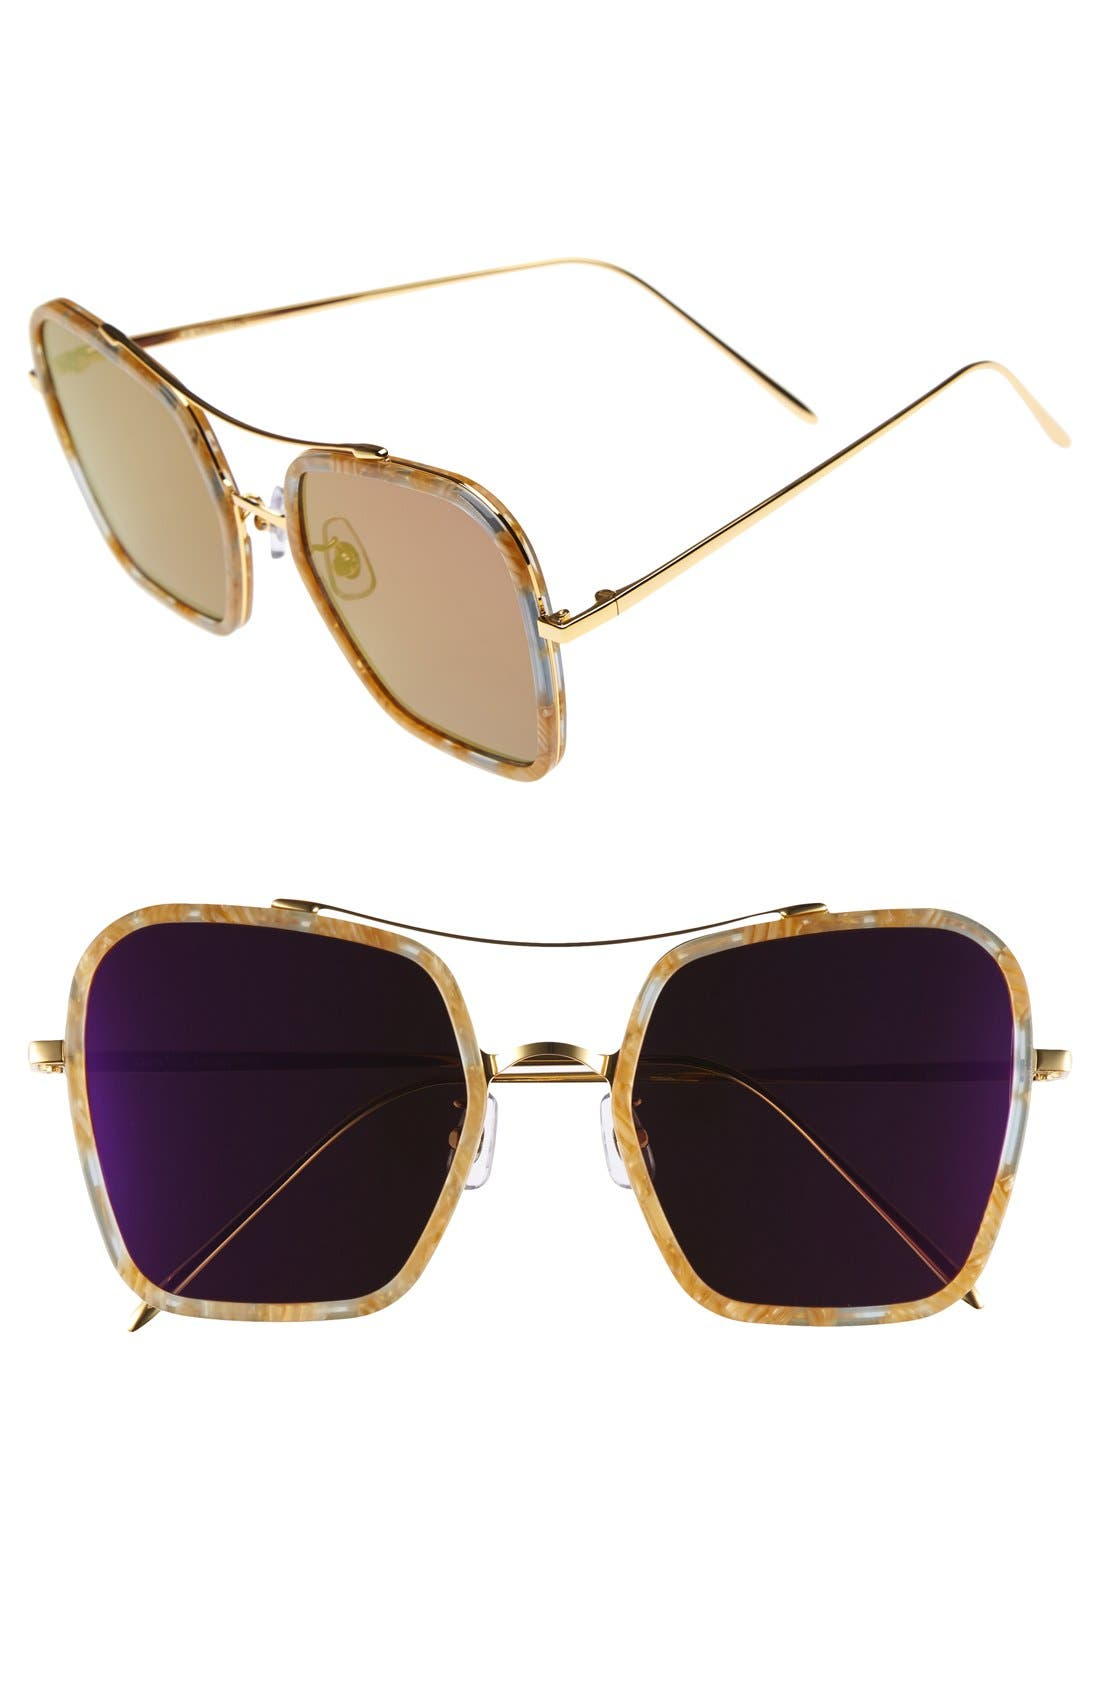 53mm Retro Square Sunglasses,                             Main thumbnail 1, color,                             200